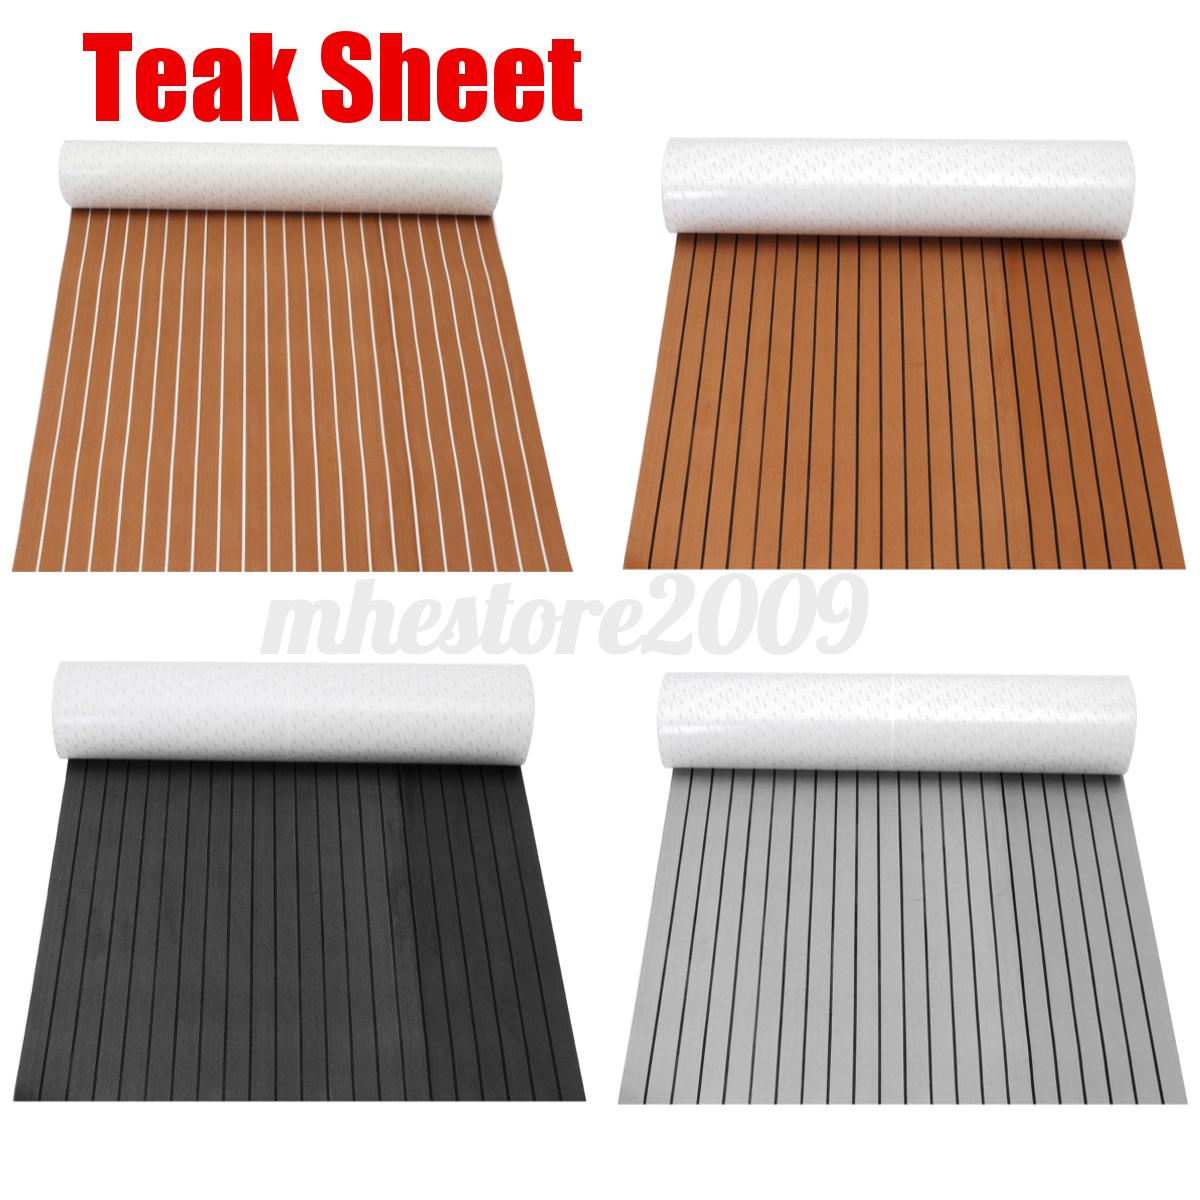 120cmx240cm Boat Decking Teak Eva Foam Marine Sheet Floor